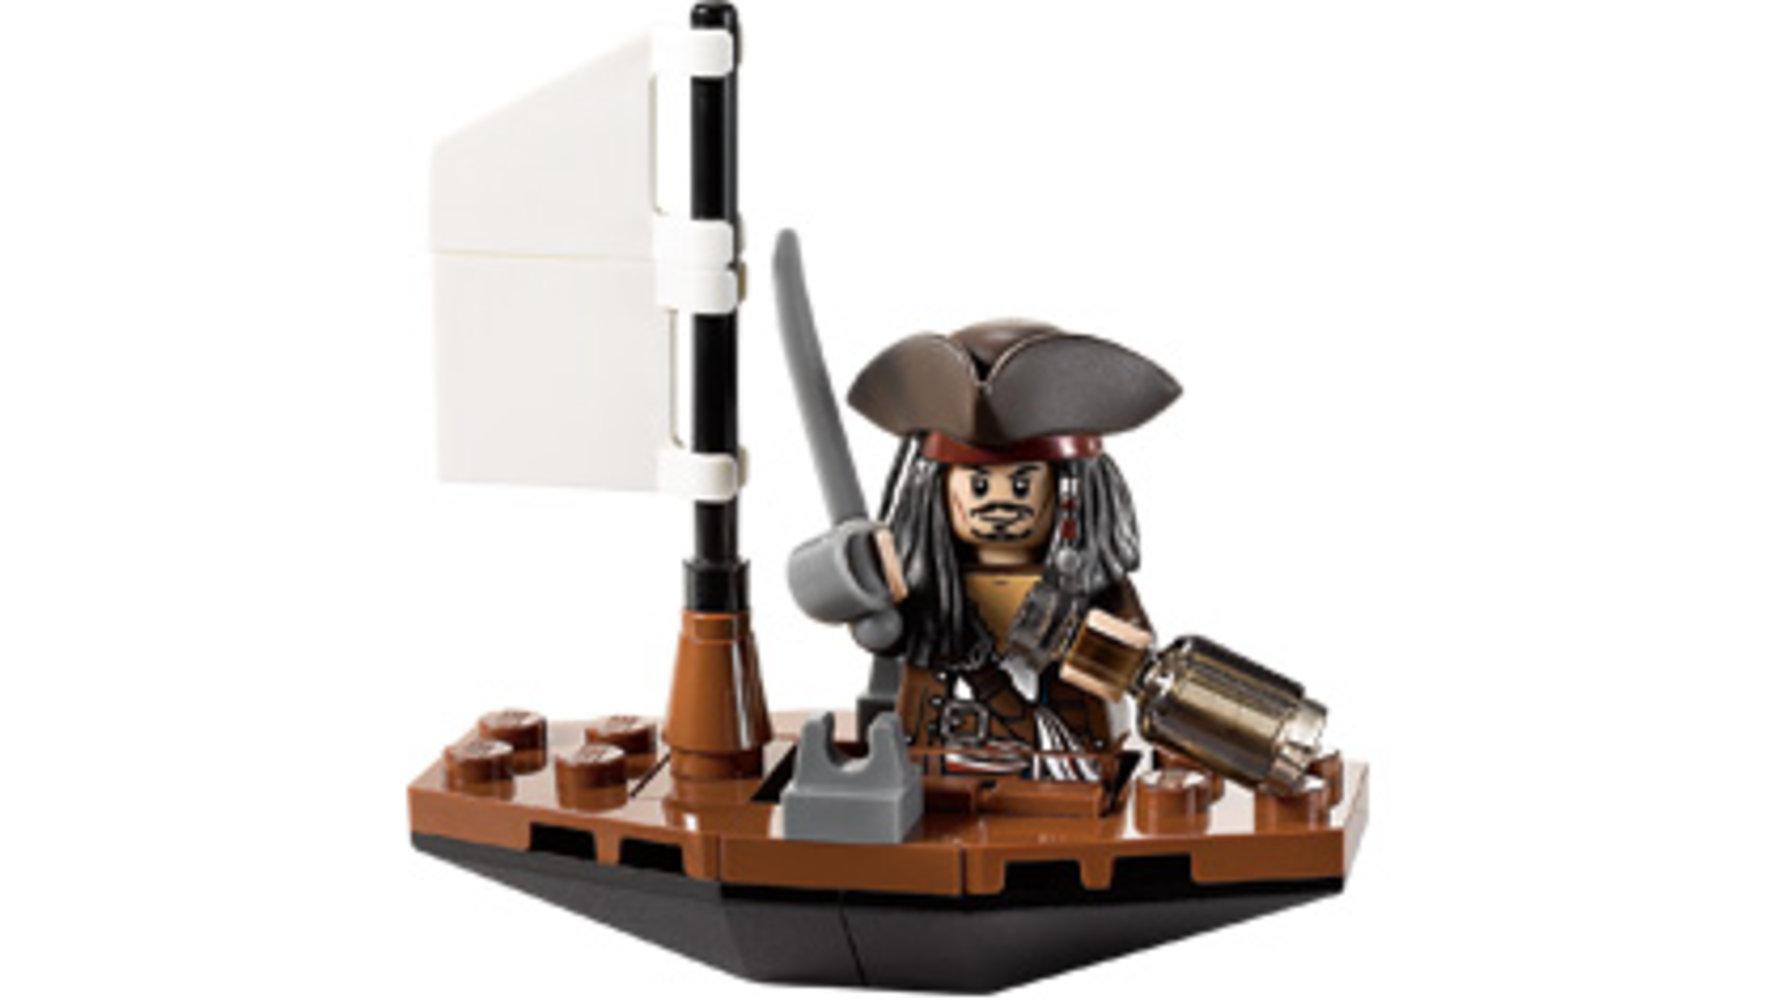 Jack Sparrow's Boat